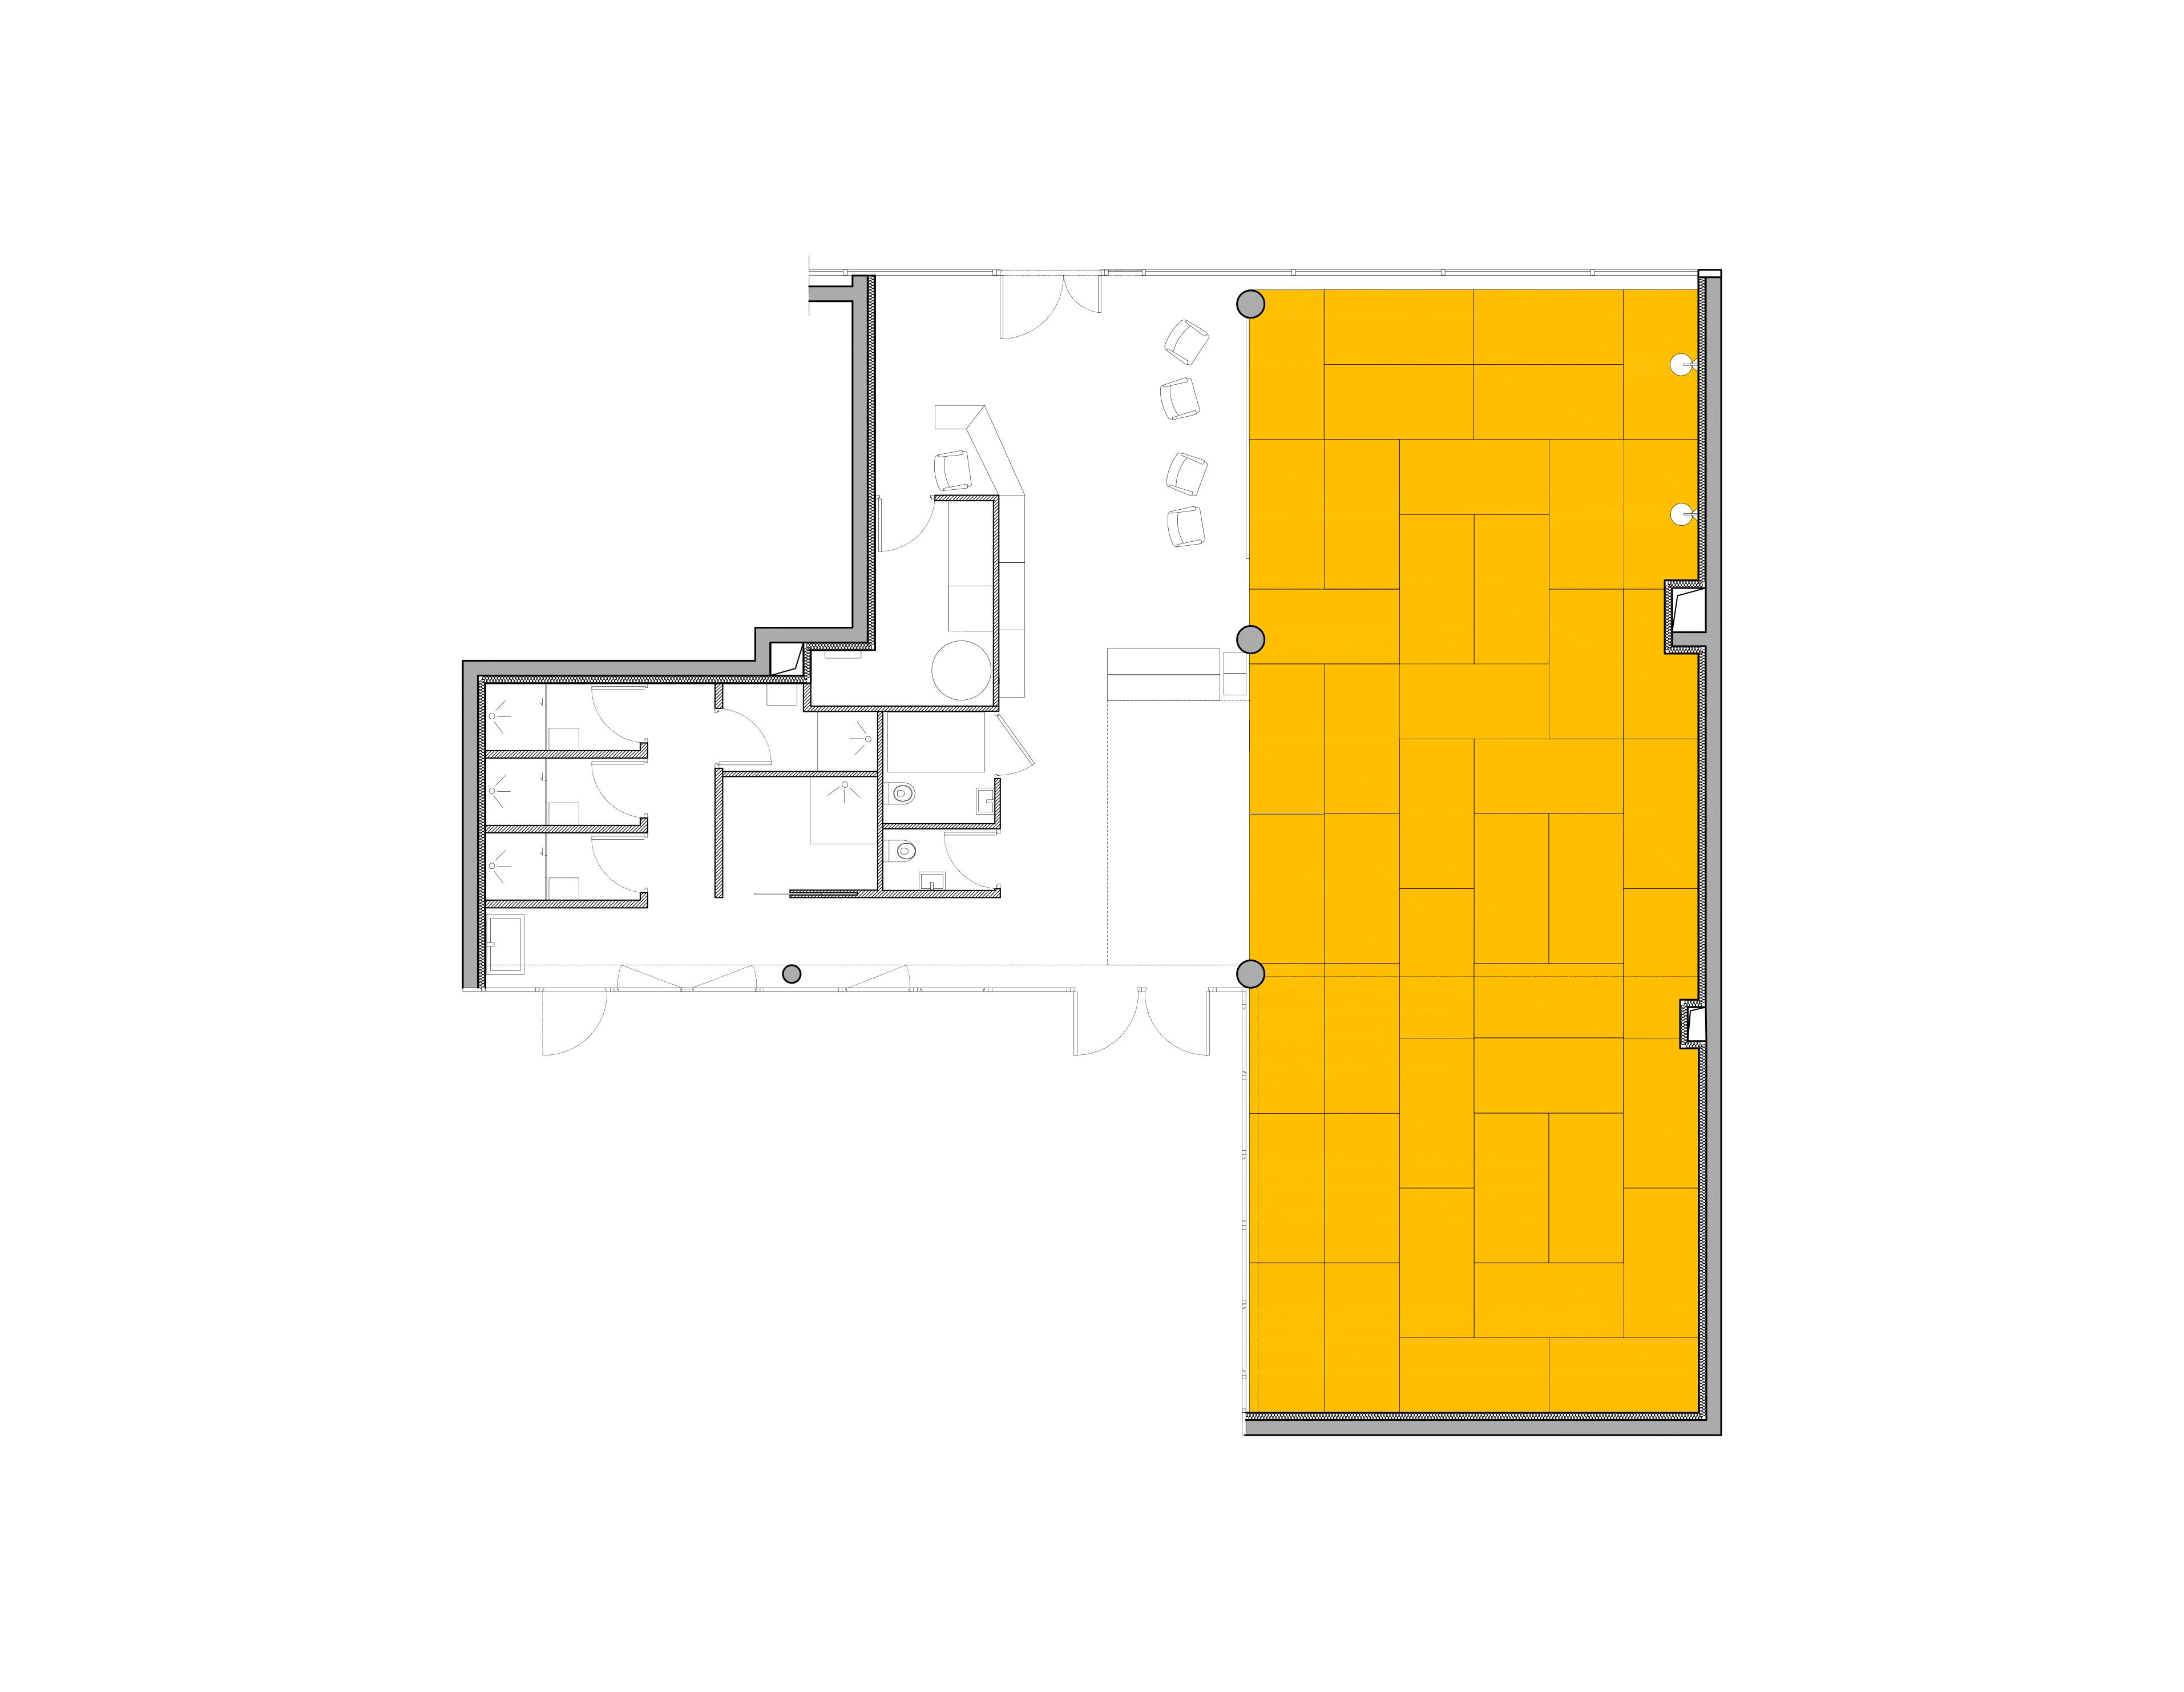 /Users/clotildenguyen/Desktop/Atelier qovop/02_ARCHIVES/NRFIGHT/